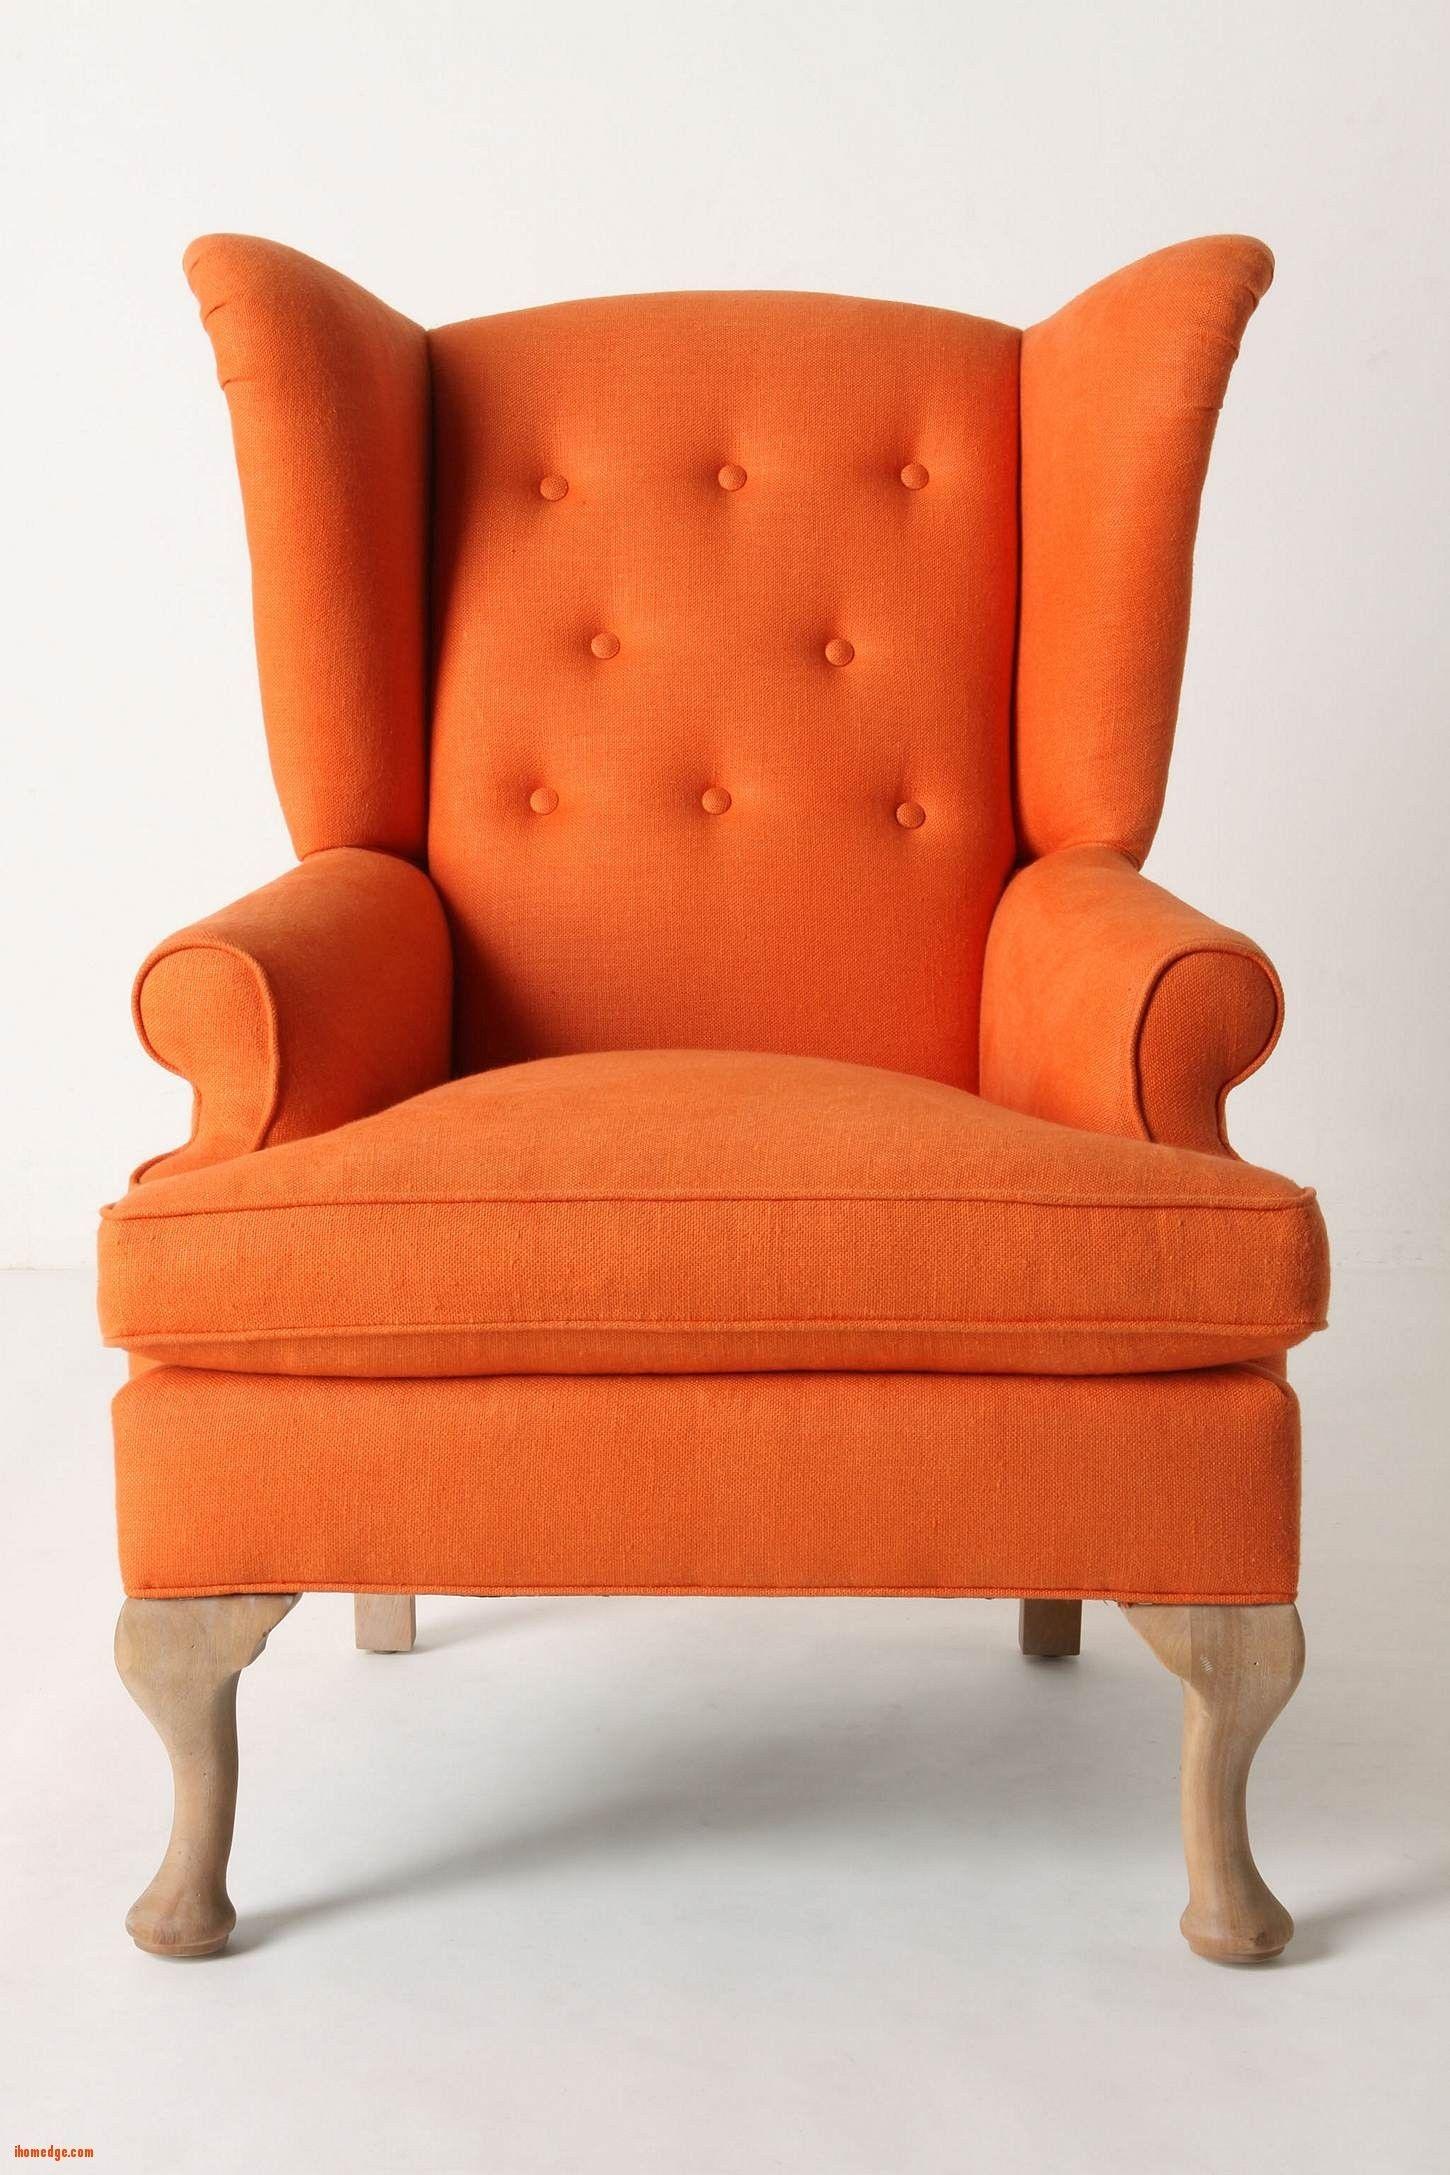 Superb Orange Armchairs